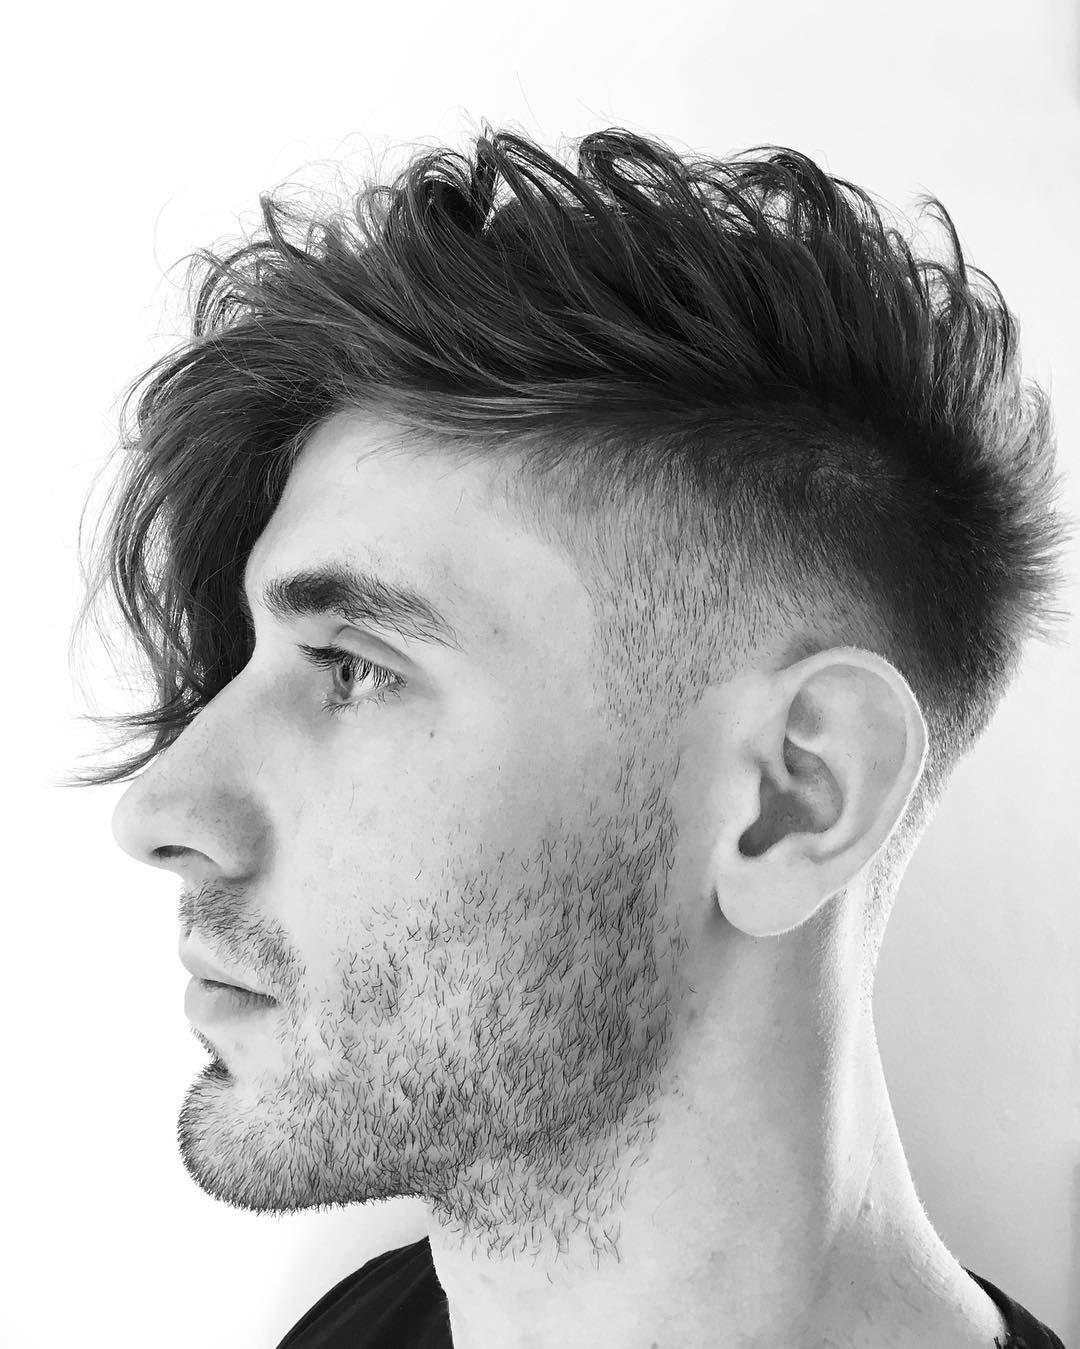 Undercut hairstyles for men men s hairstyles and haircuts for 2017 - Men S Hairstyles 2017